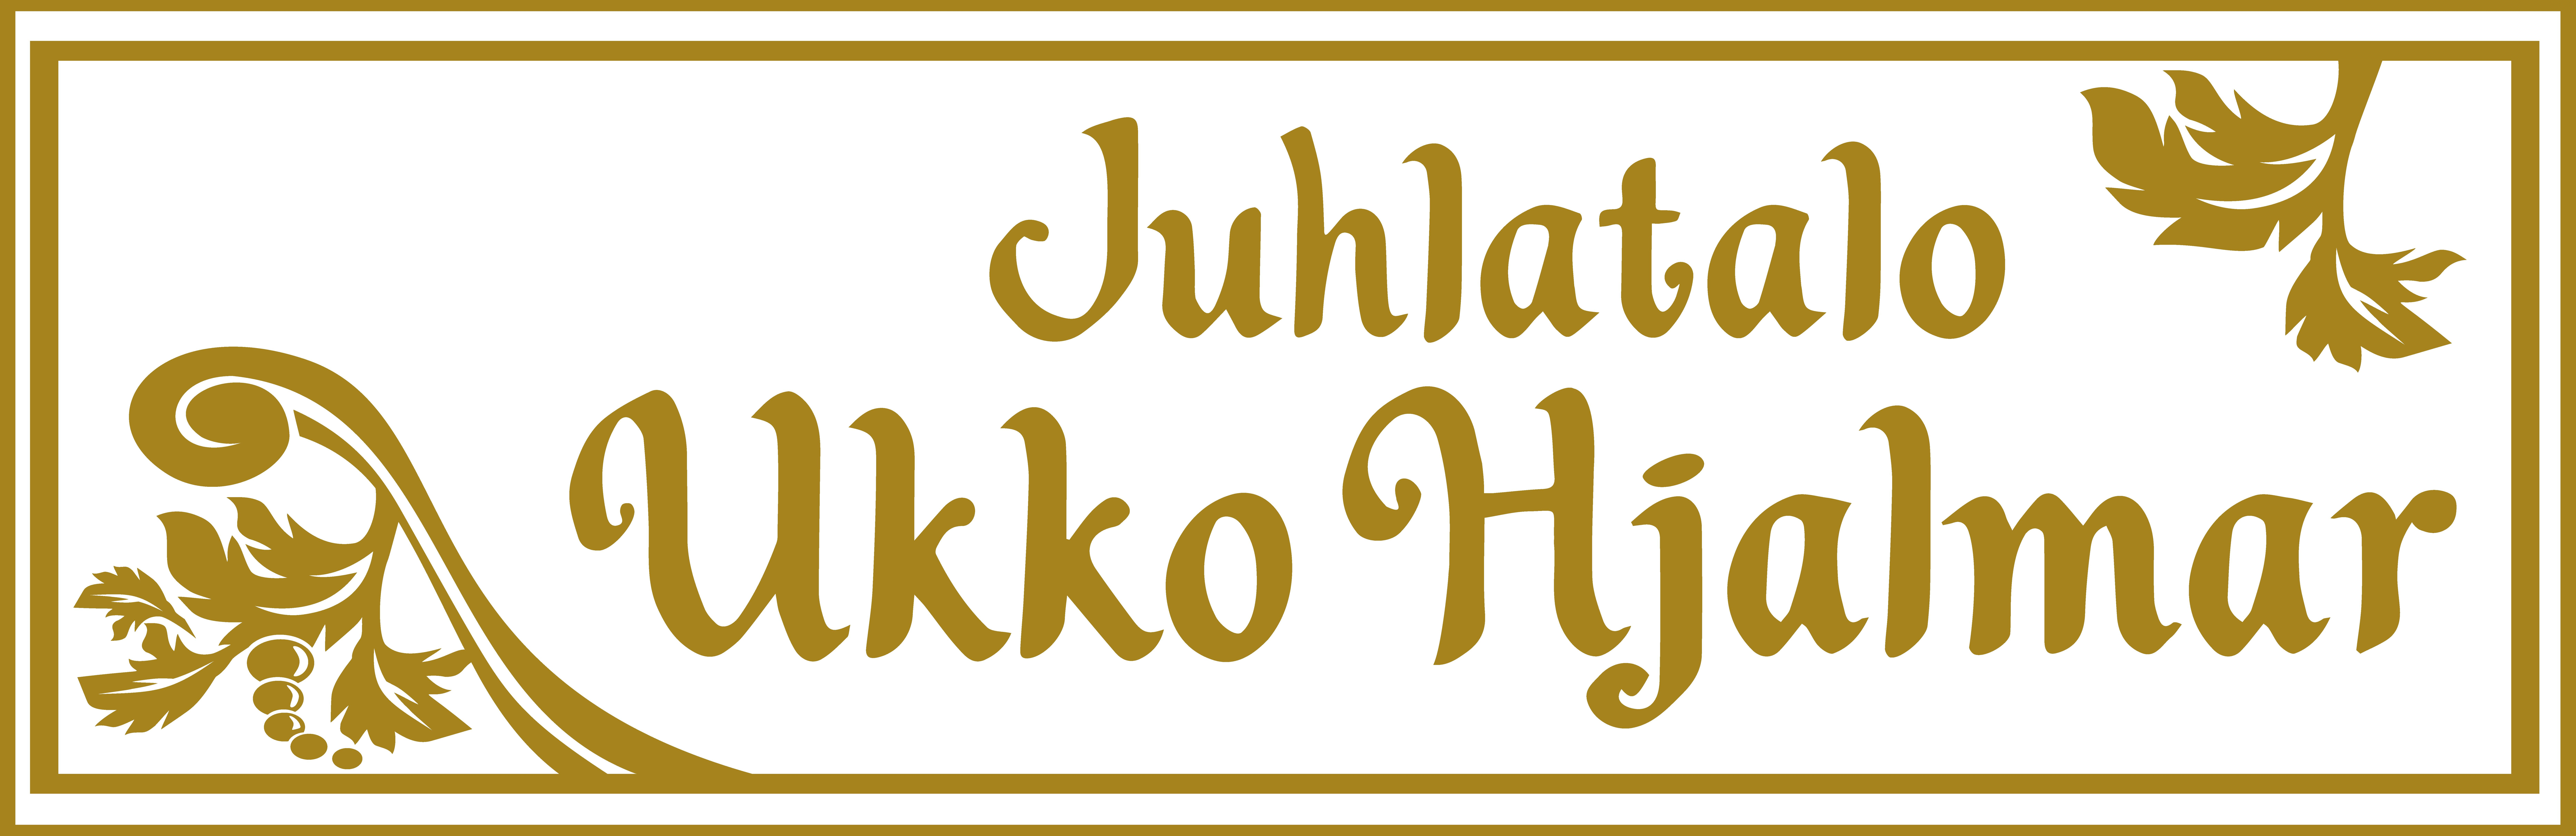 Juhlatalo Ukko Hjalmar